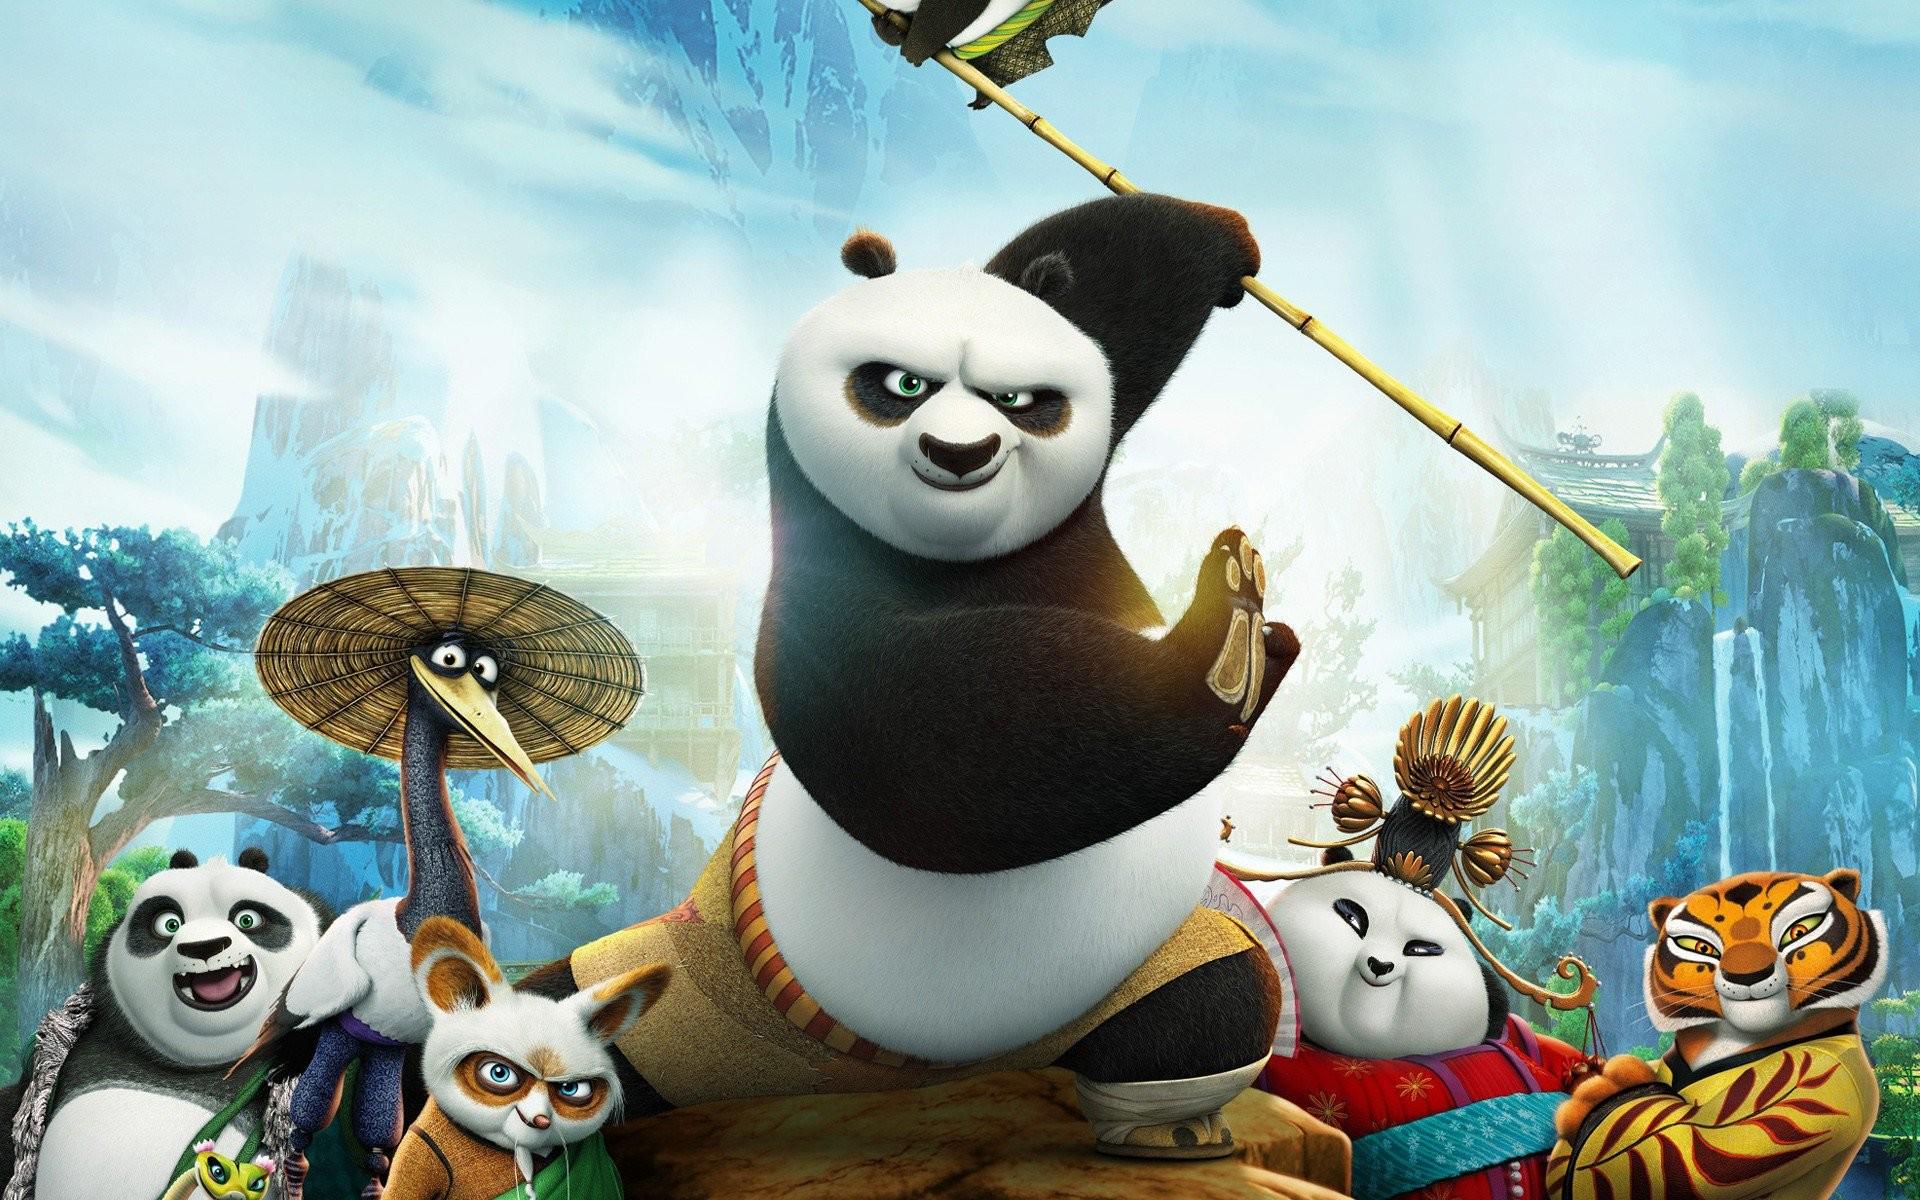 Launch Trailer Kung Fu Panda 3 Movie 4K Wallpaper | Free 4K Wallpaper |  Download Wallpaper | Pinterest | Kung fu panda, Kung fu and Wallpaper